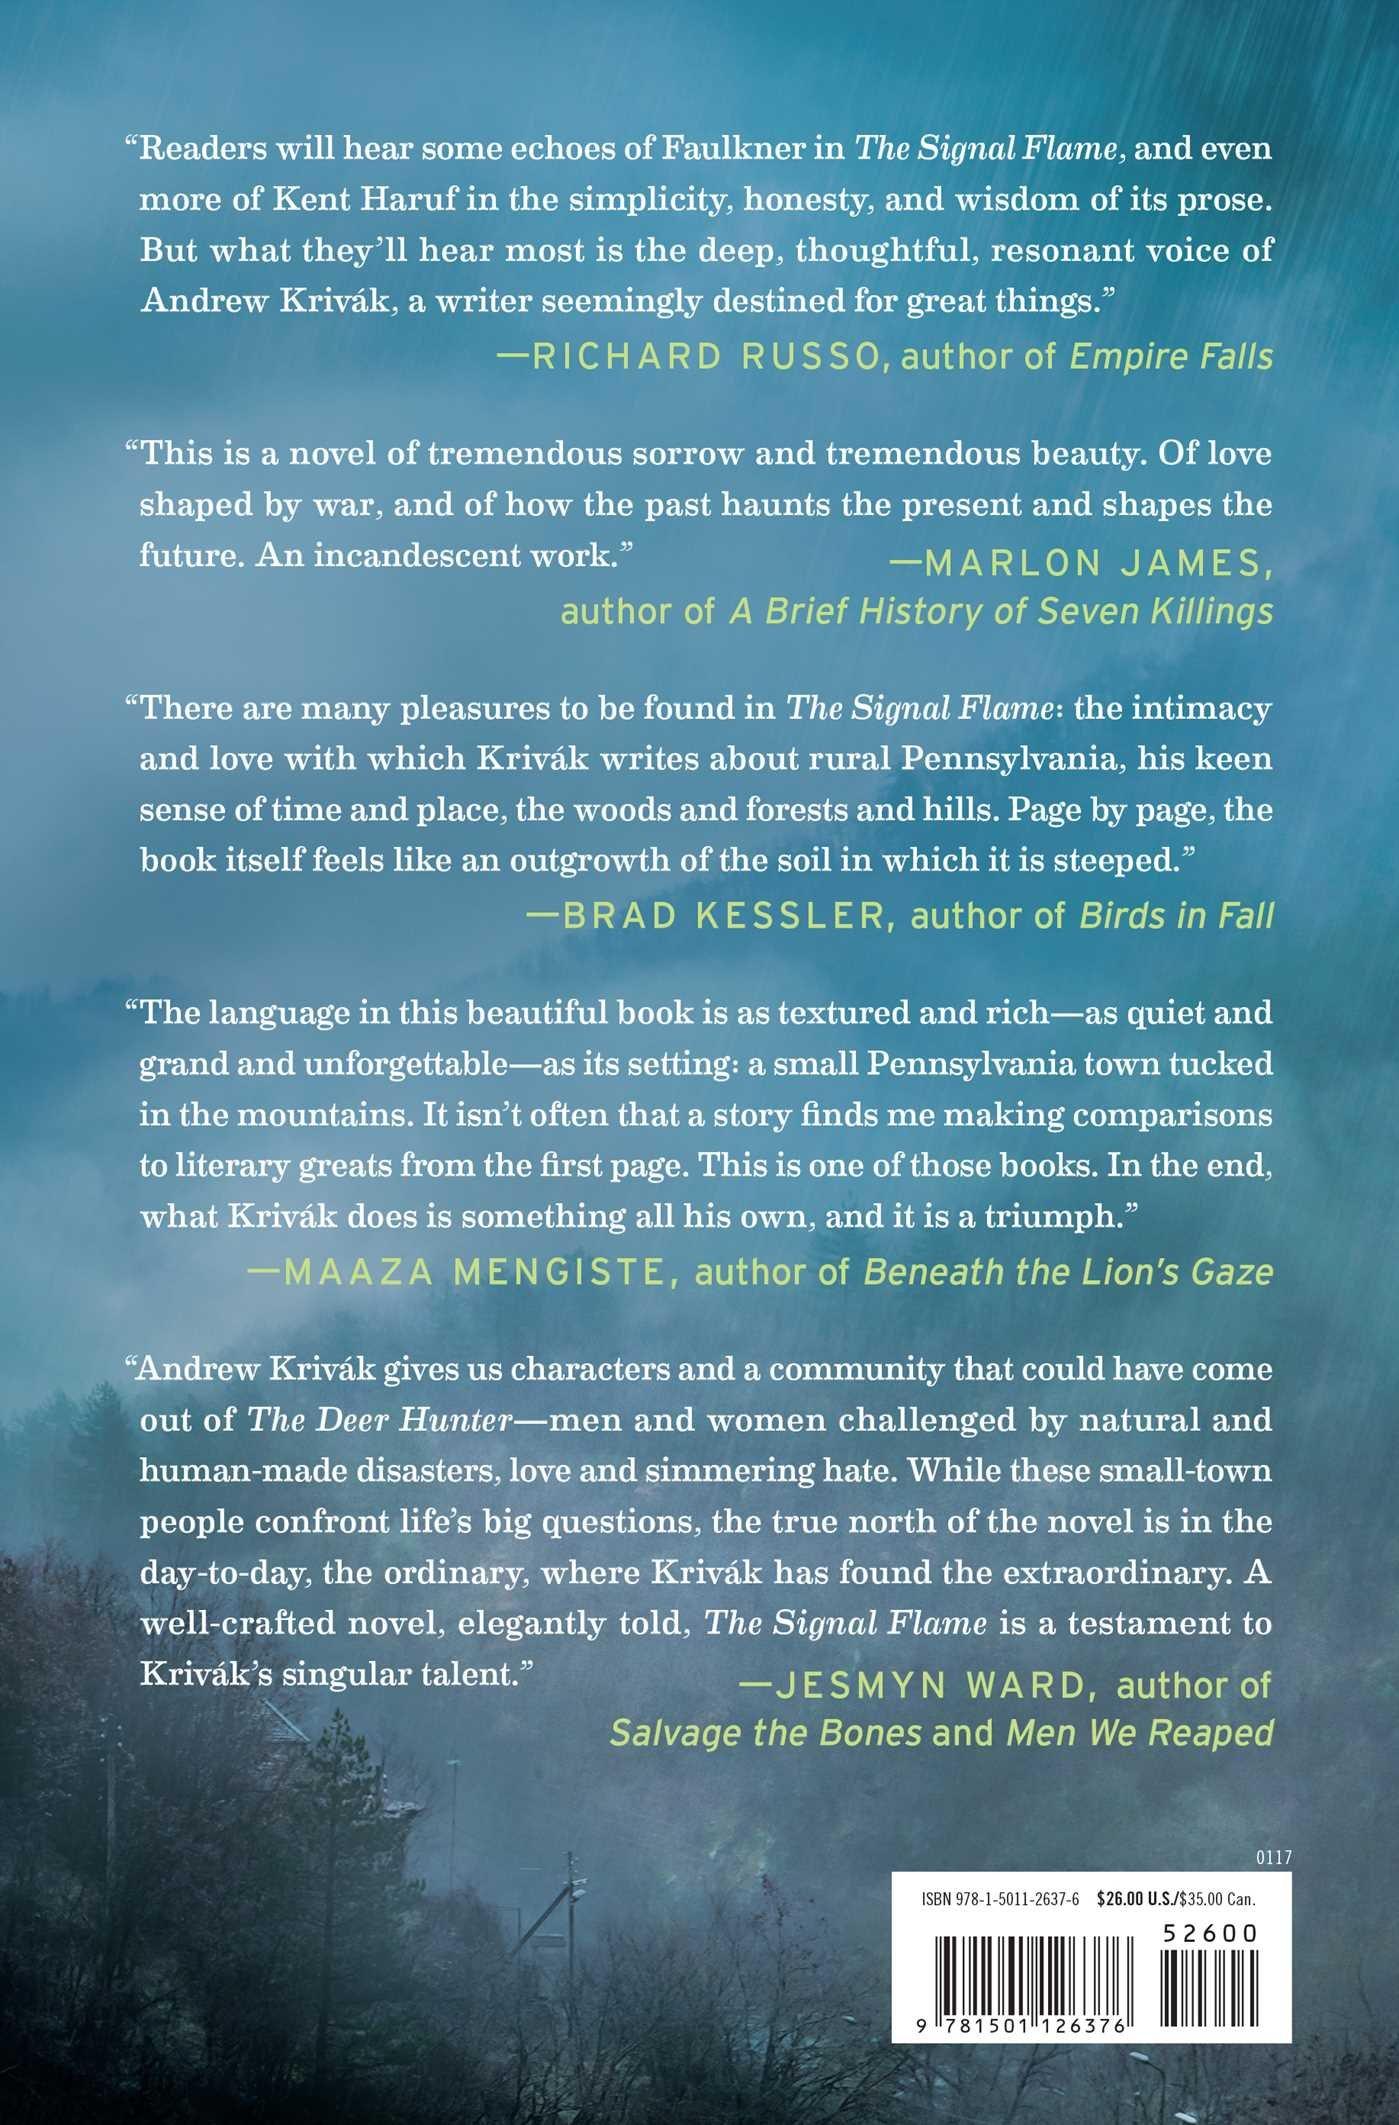 The Signal Flame: A Novel: Andrew Krivak: 9781501126376: Amazon: Books